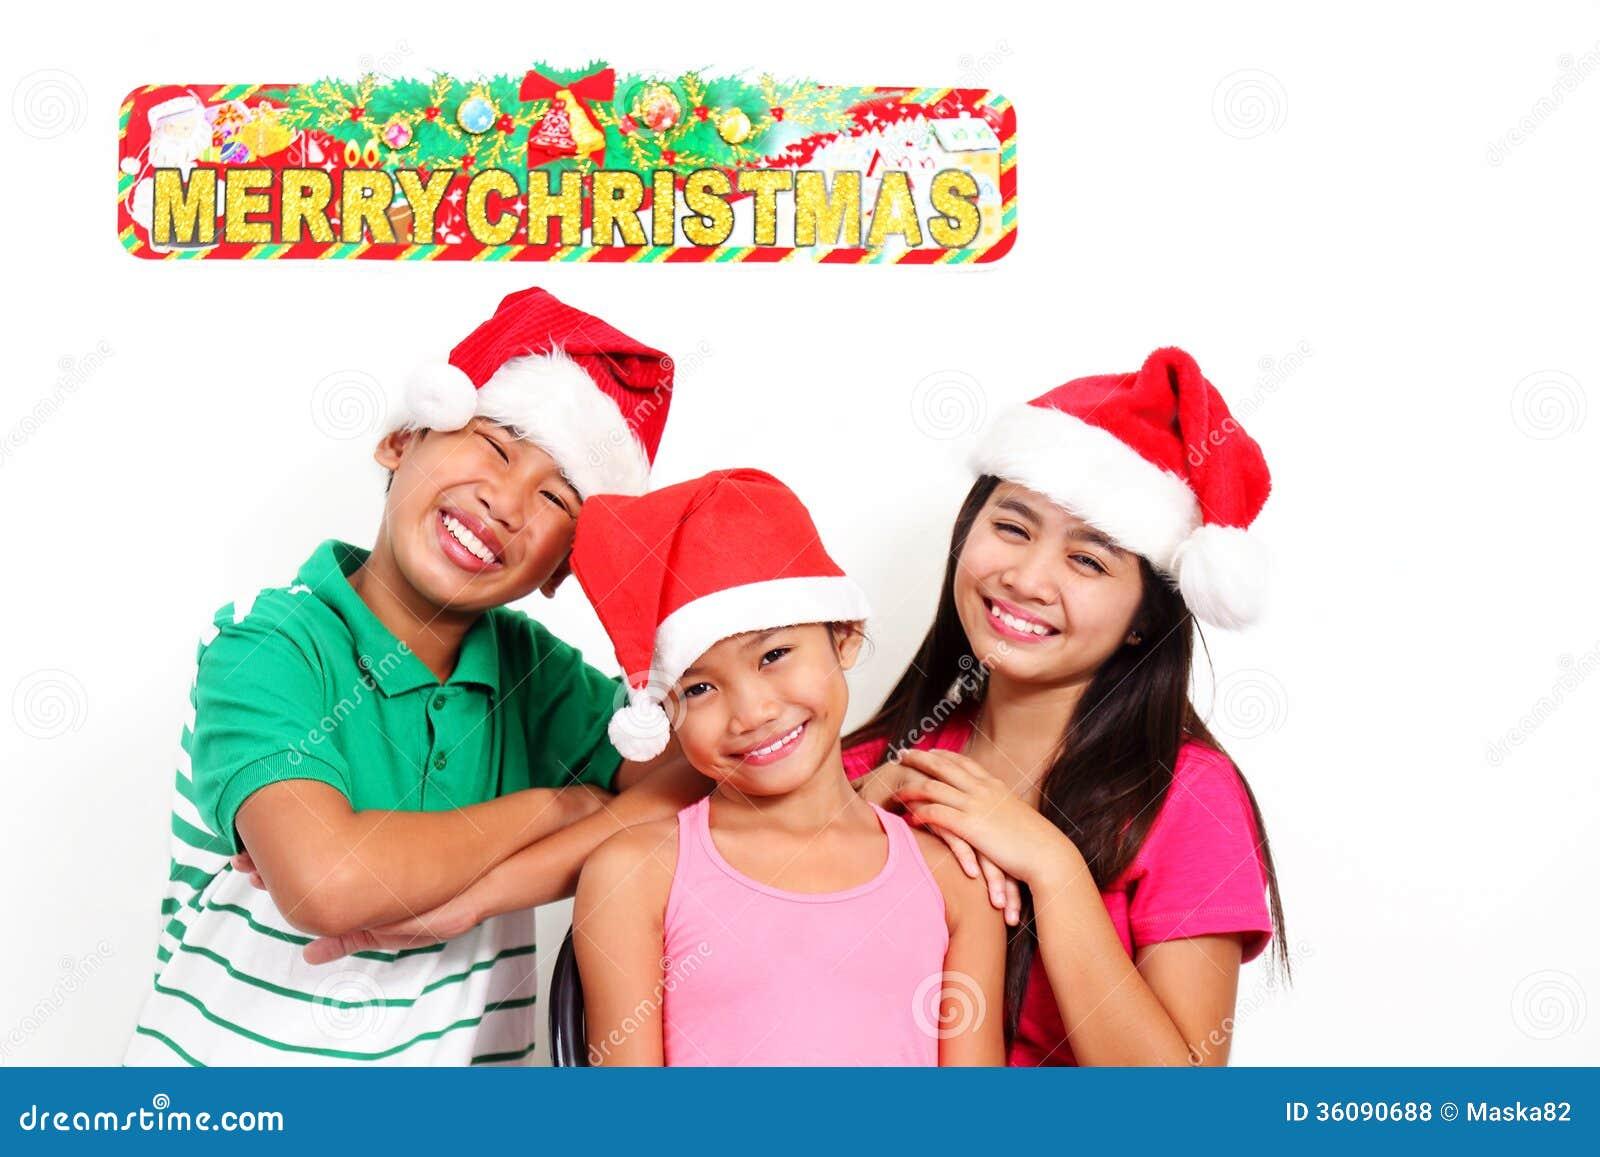 Happy Kids At Christmas Royalty Free Stock Photos - Image: 36090688